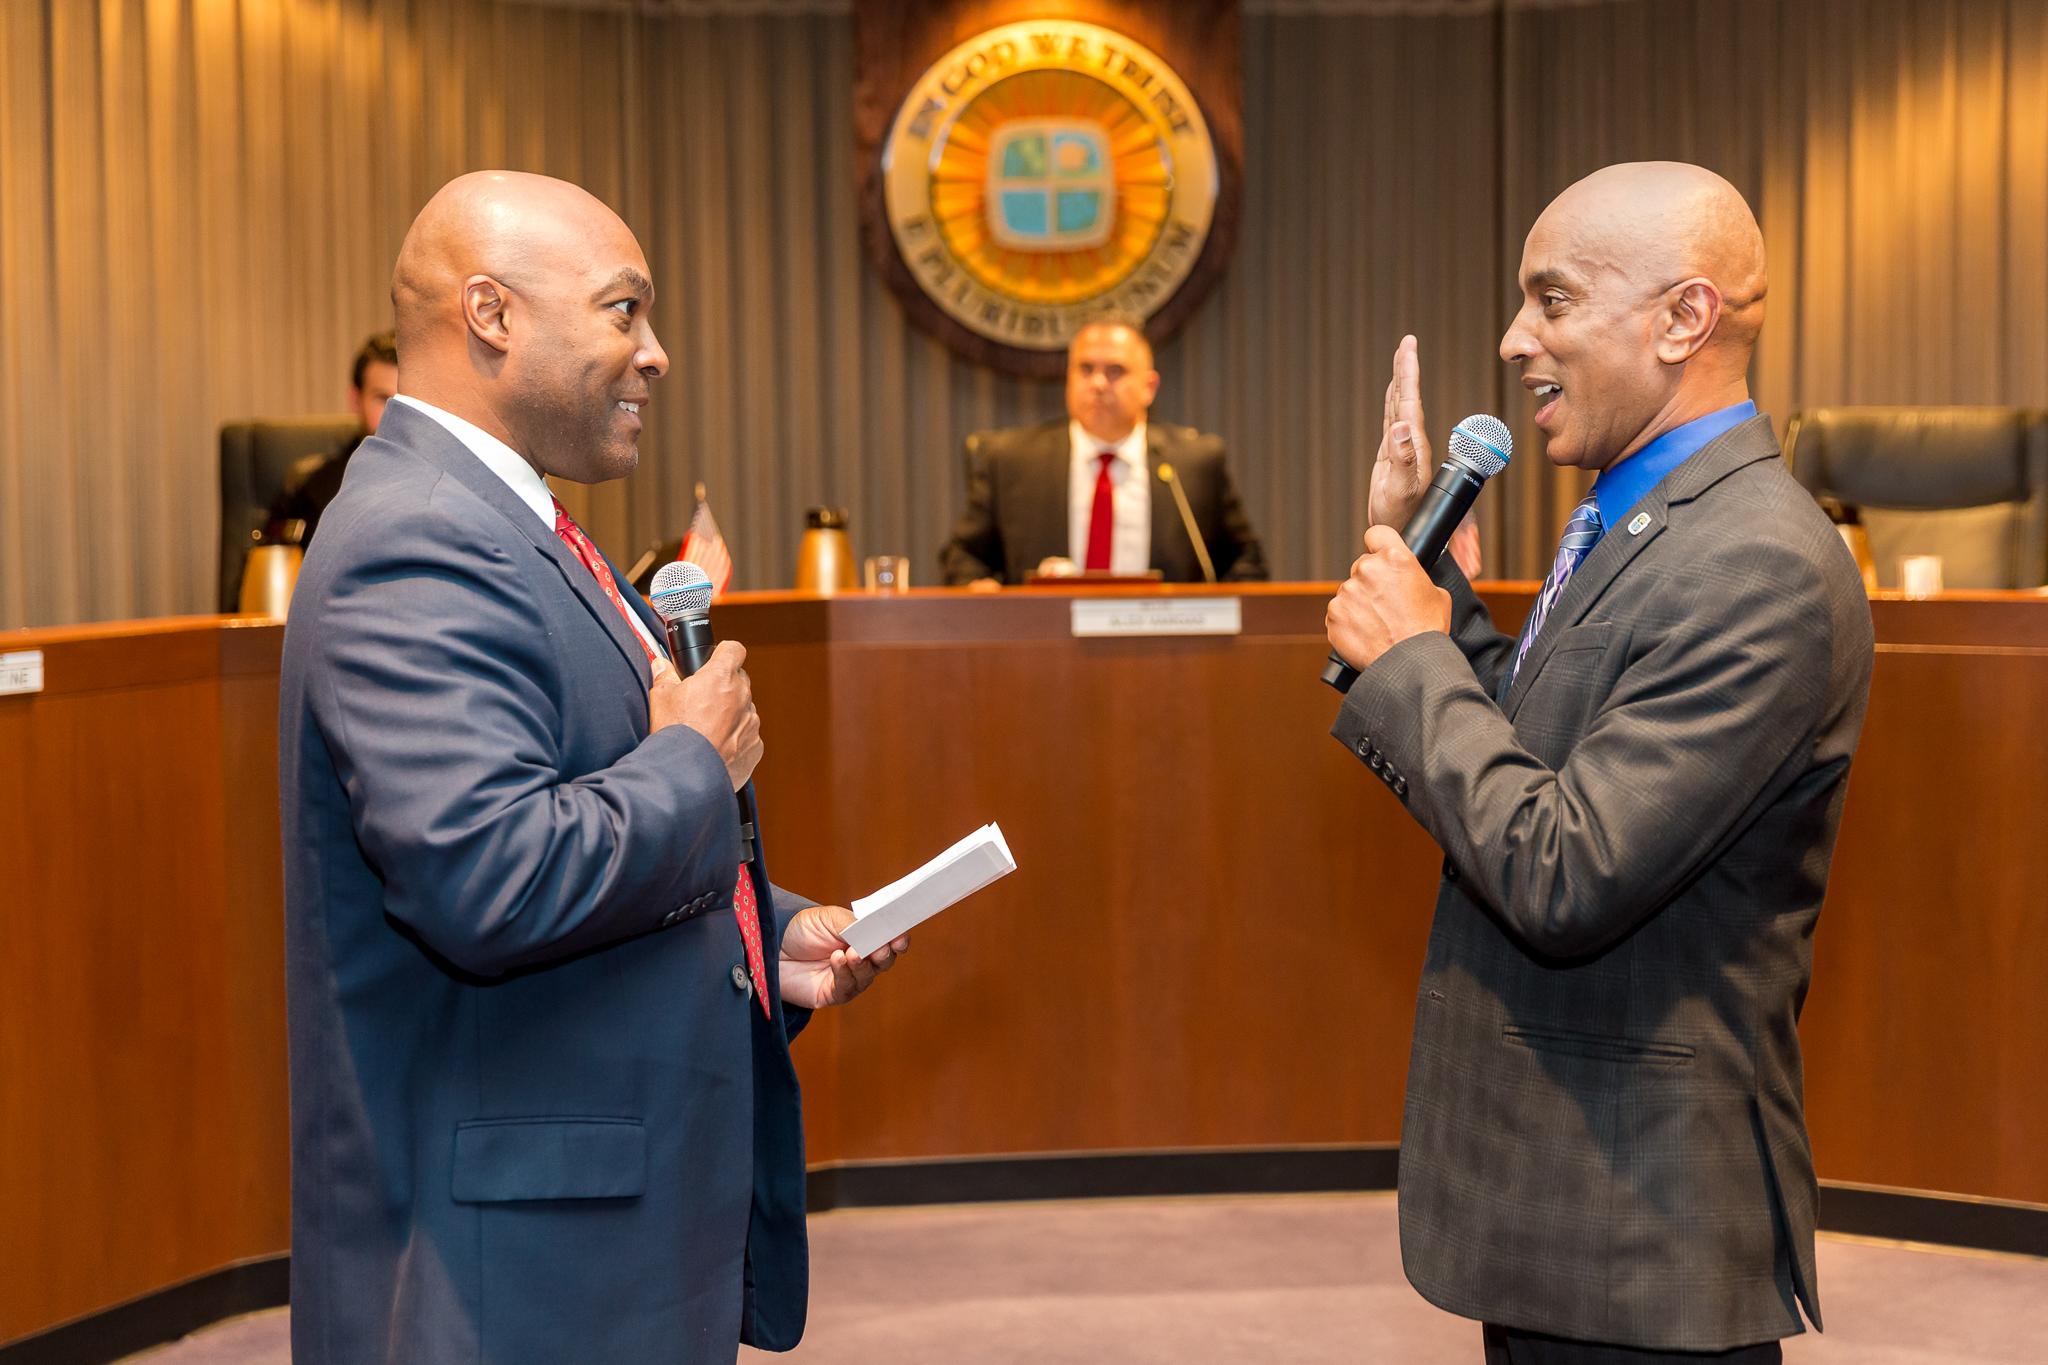 Councilman Alex Monteiro oath of office